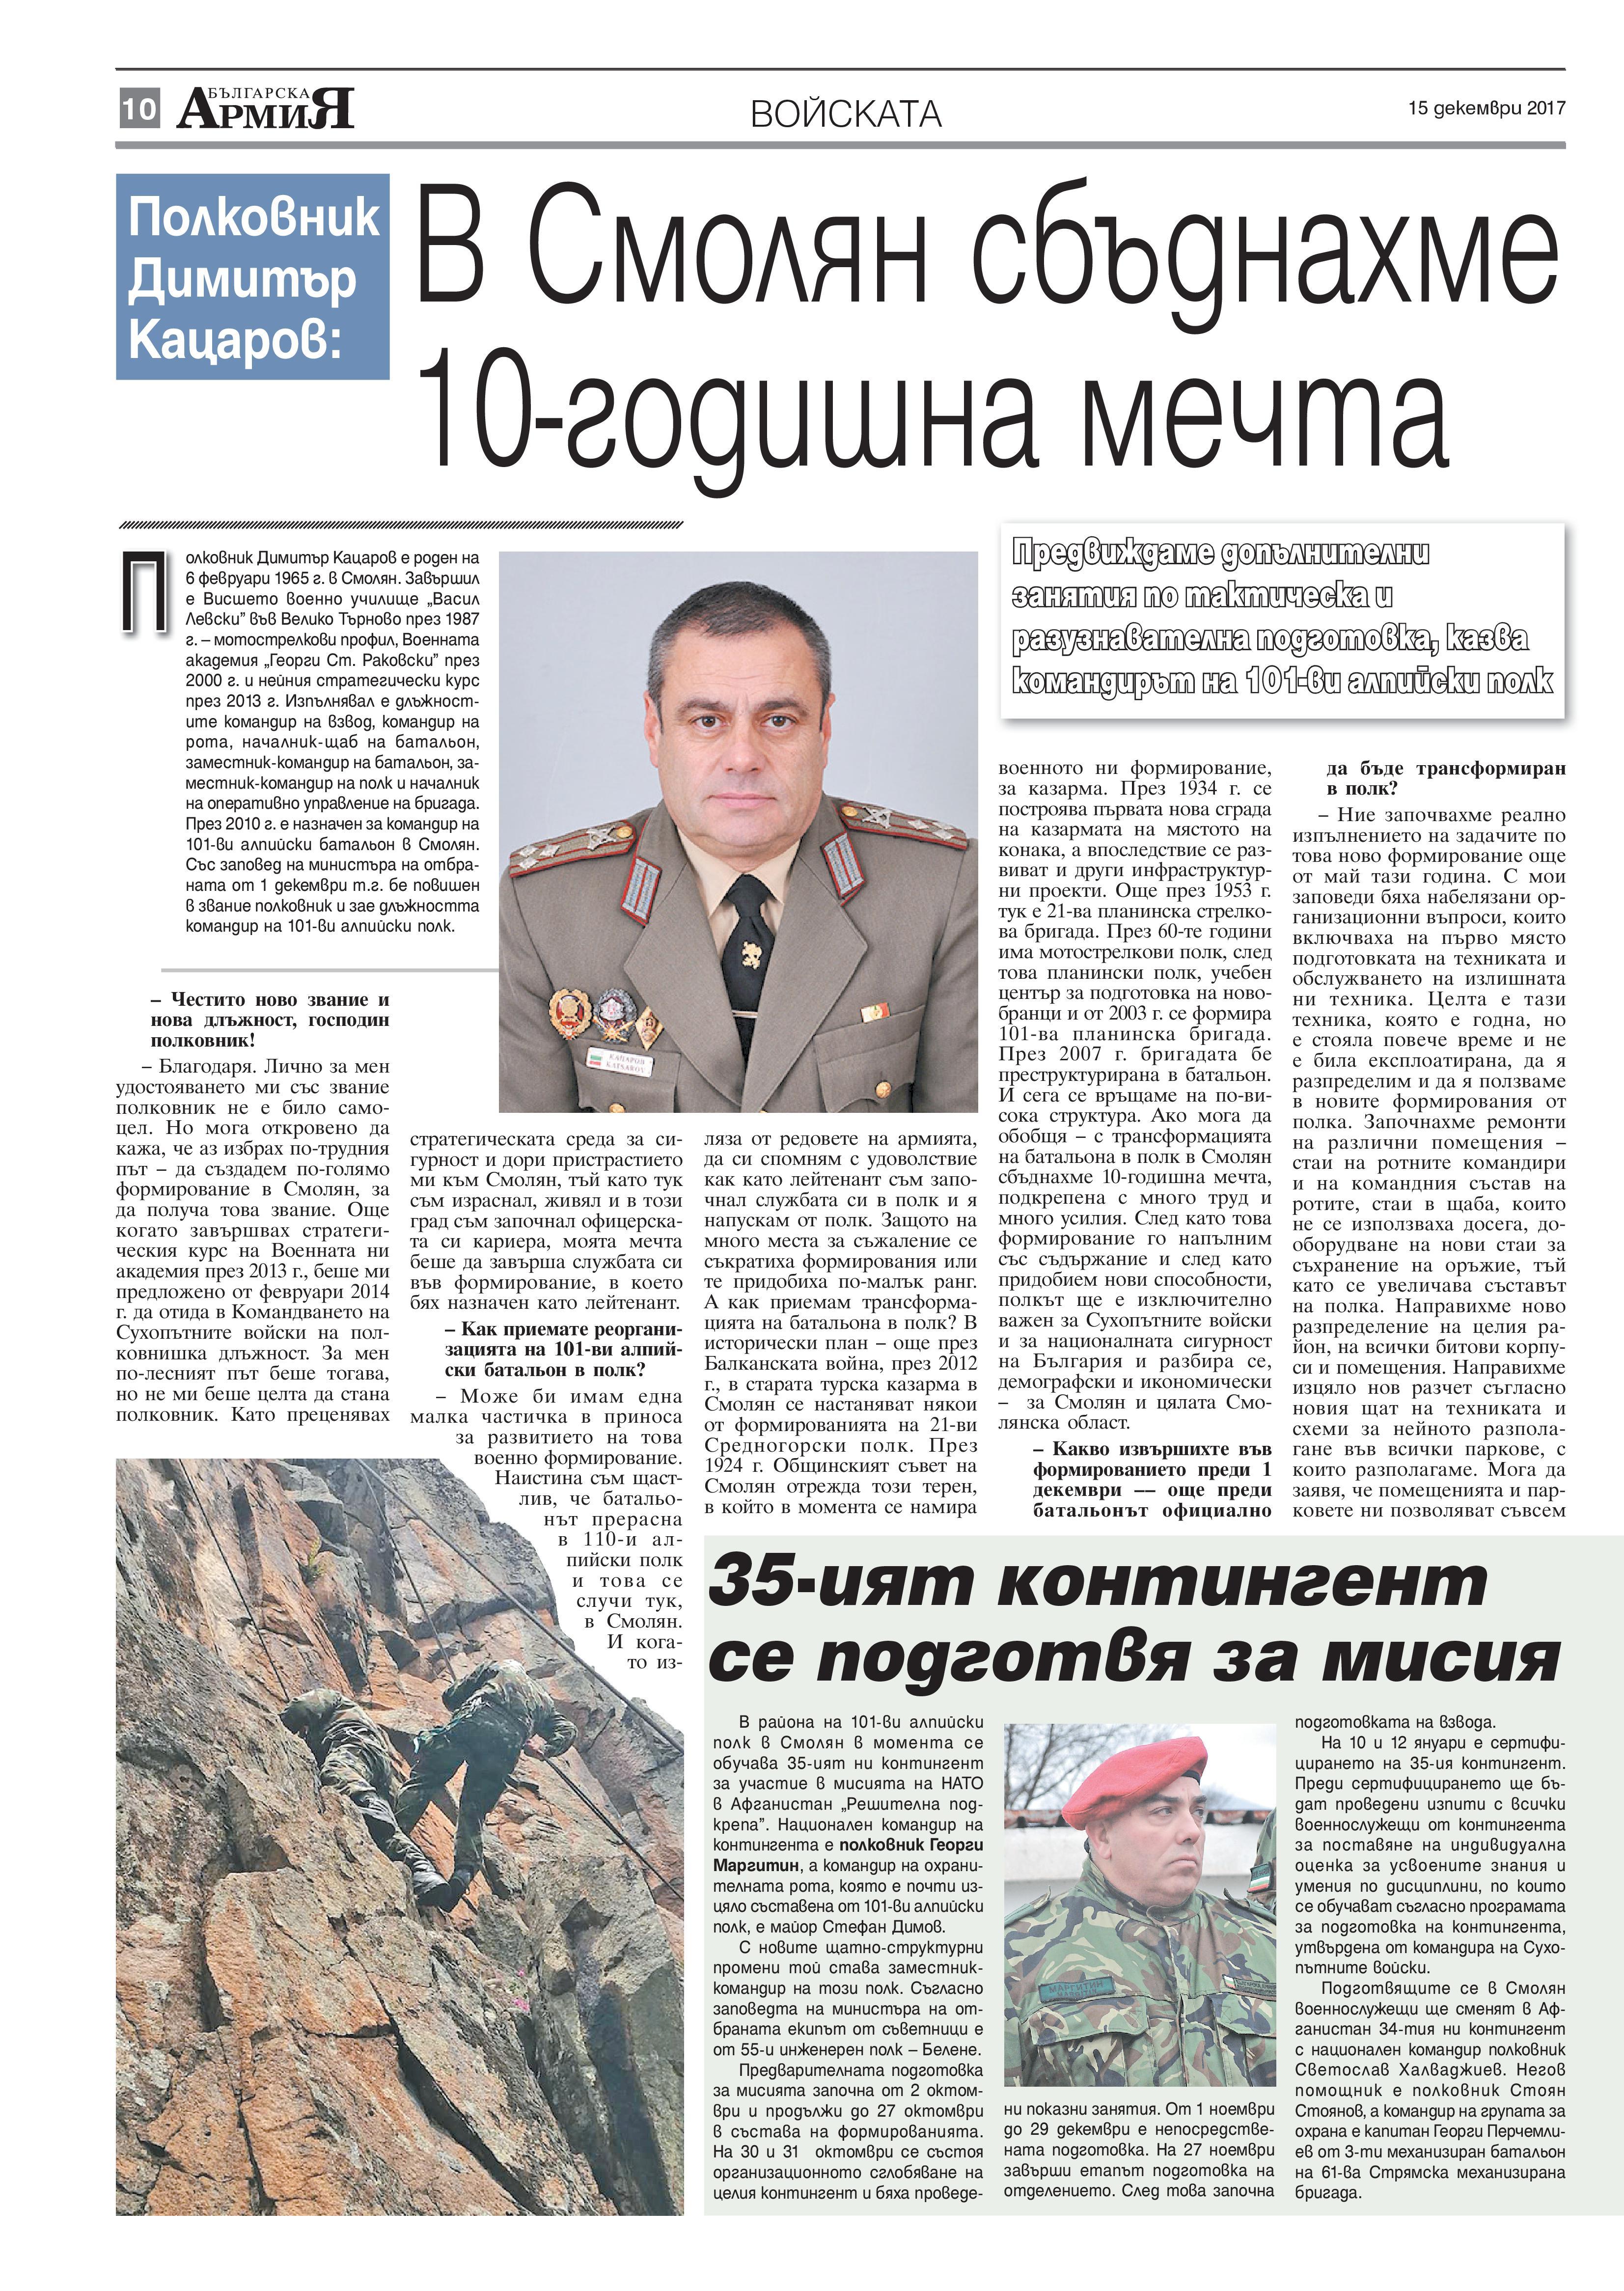 http://armymedia.bg/wp-content/uploads/2015/06/10-15.jpg